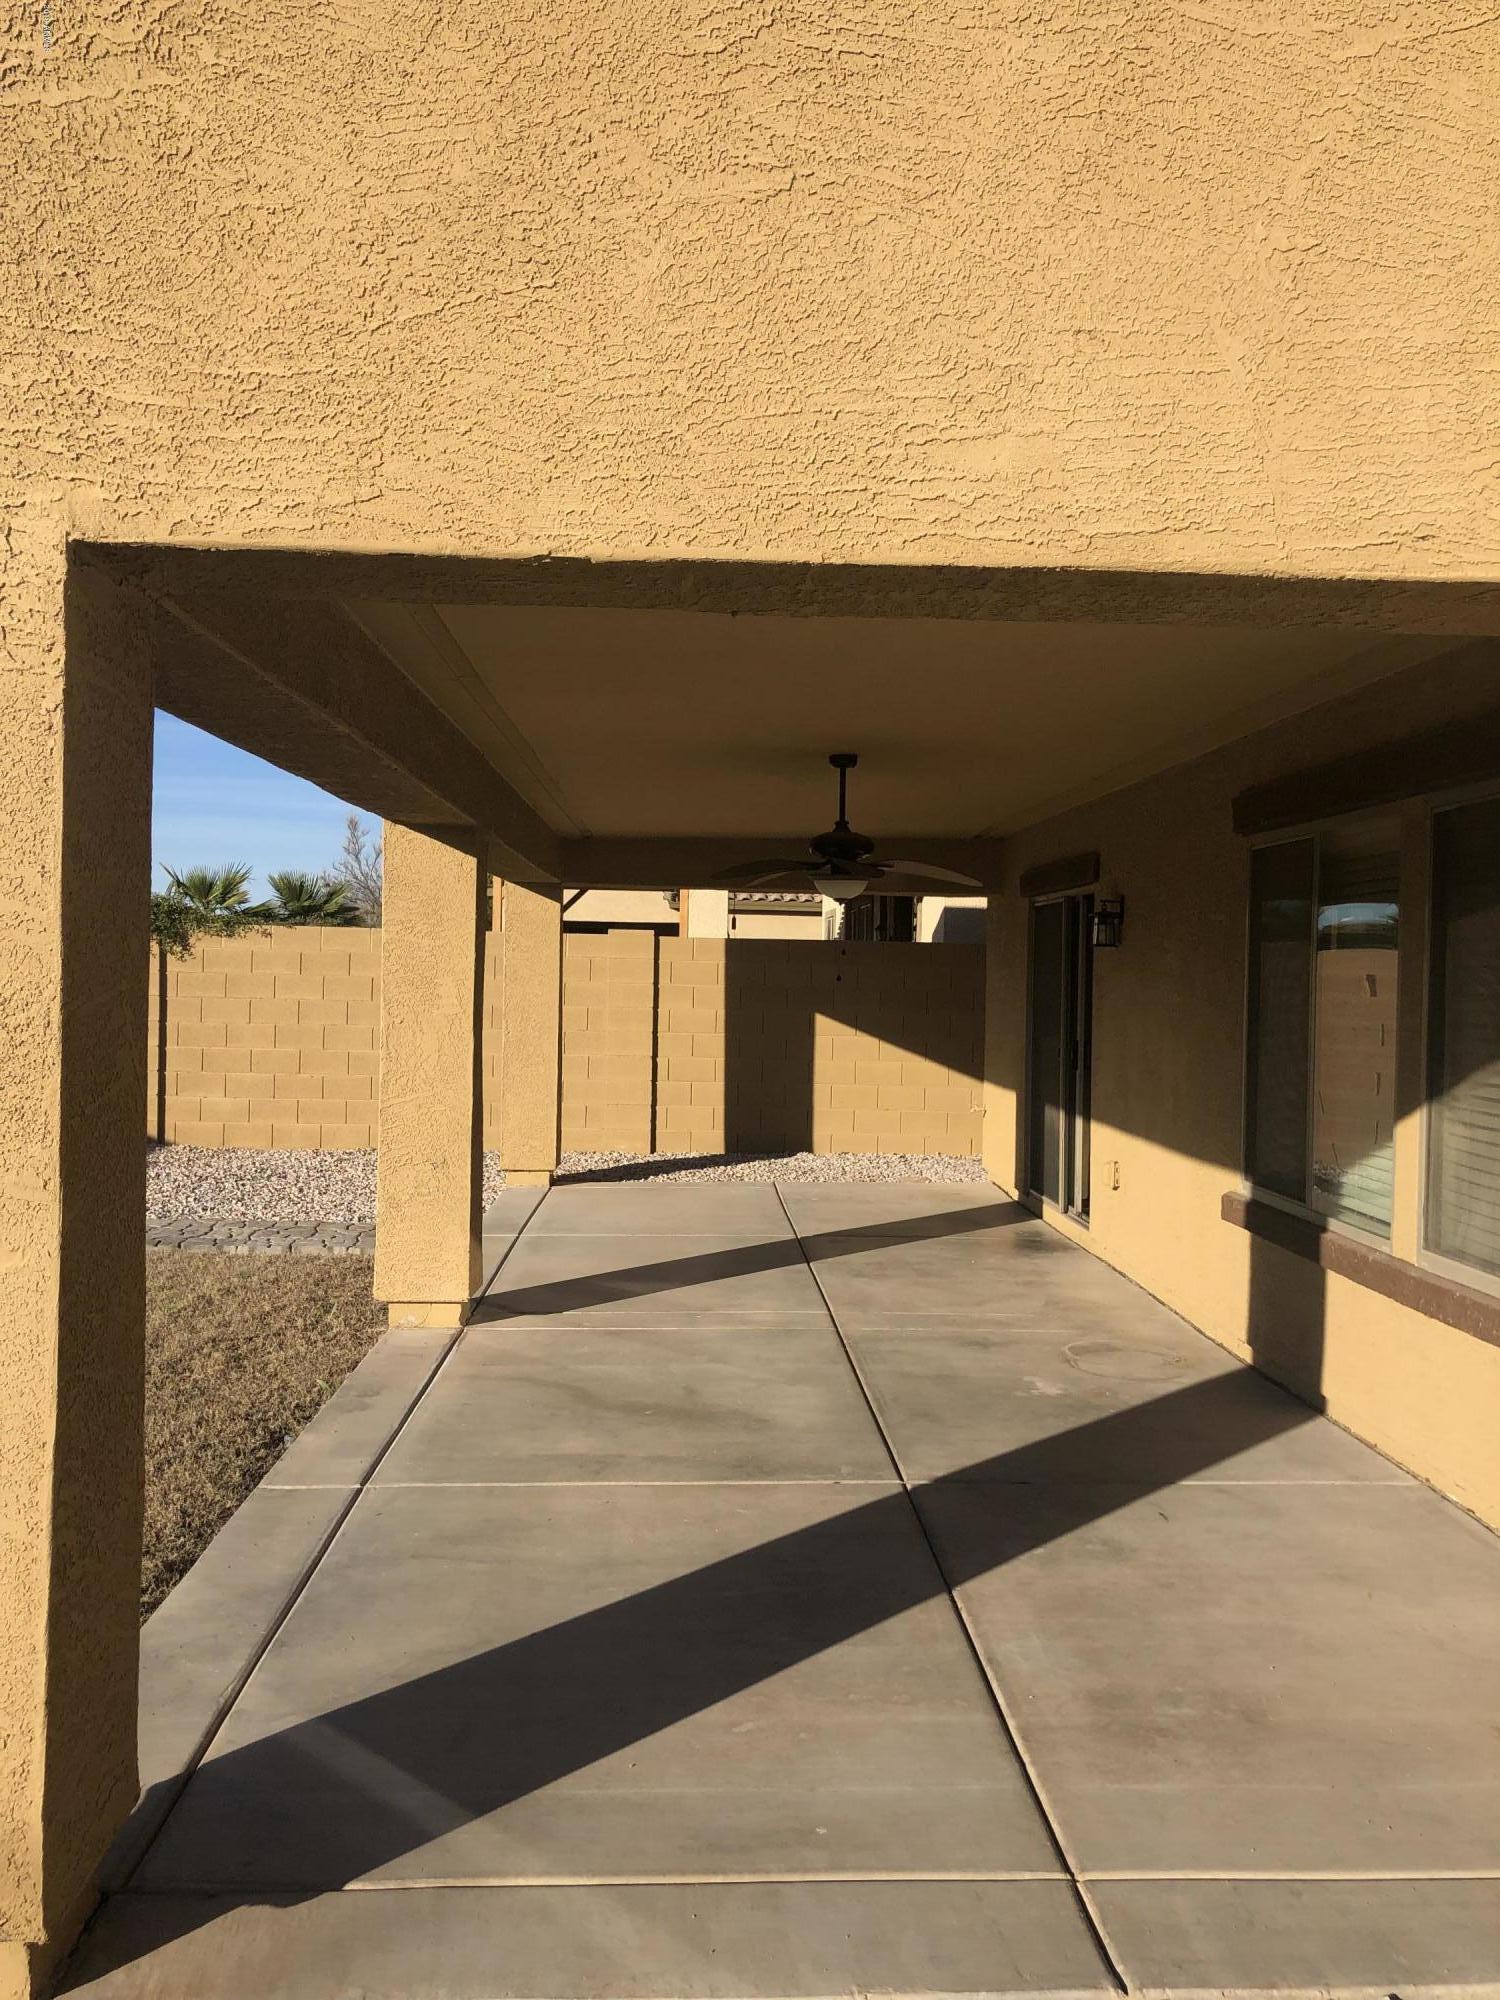 MLS 5883729 17766 N BELL POINTE Boulevard, Surprise, AZ 85374 Surprise AZ Bell Pointe